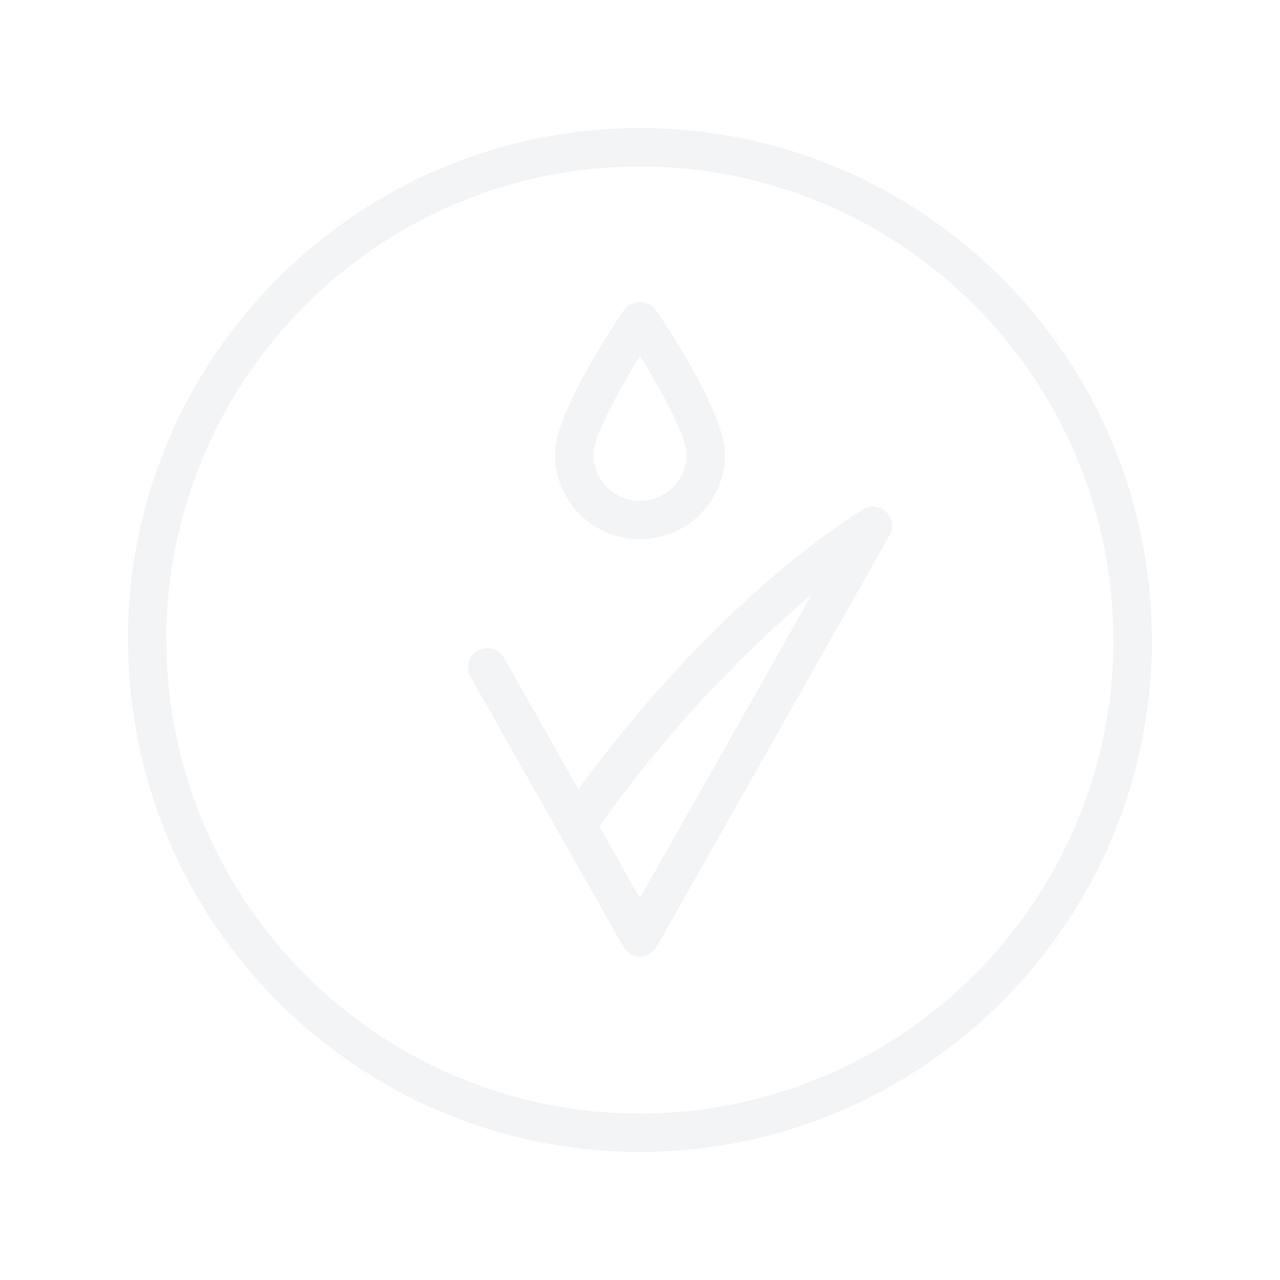 MITOMO Sake Essence Mask тканевая маска с органическими кислотами  25g